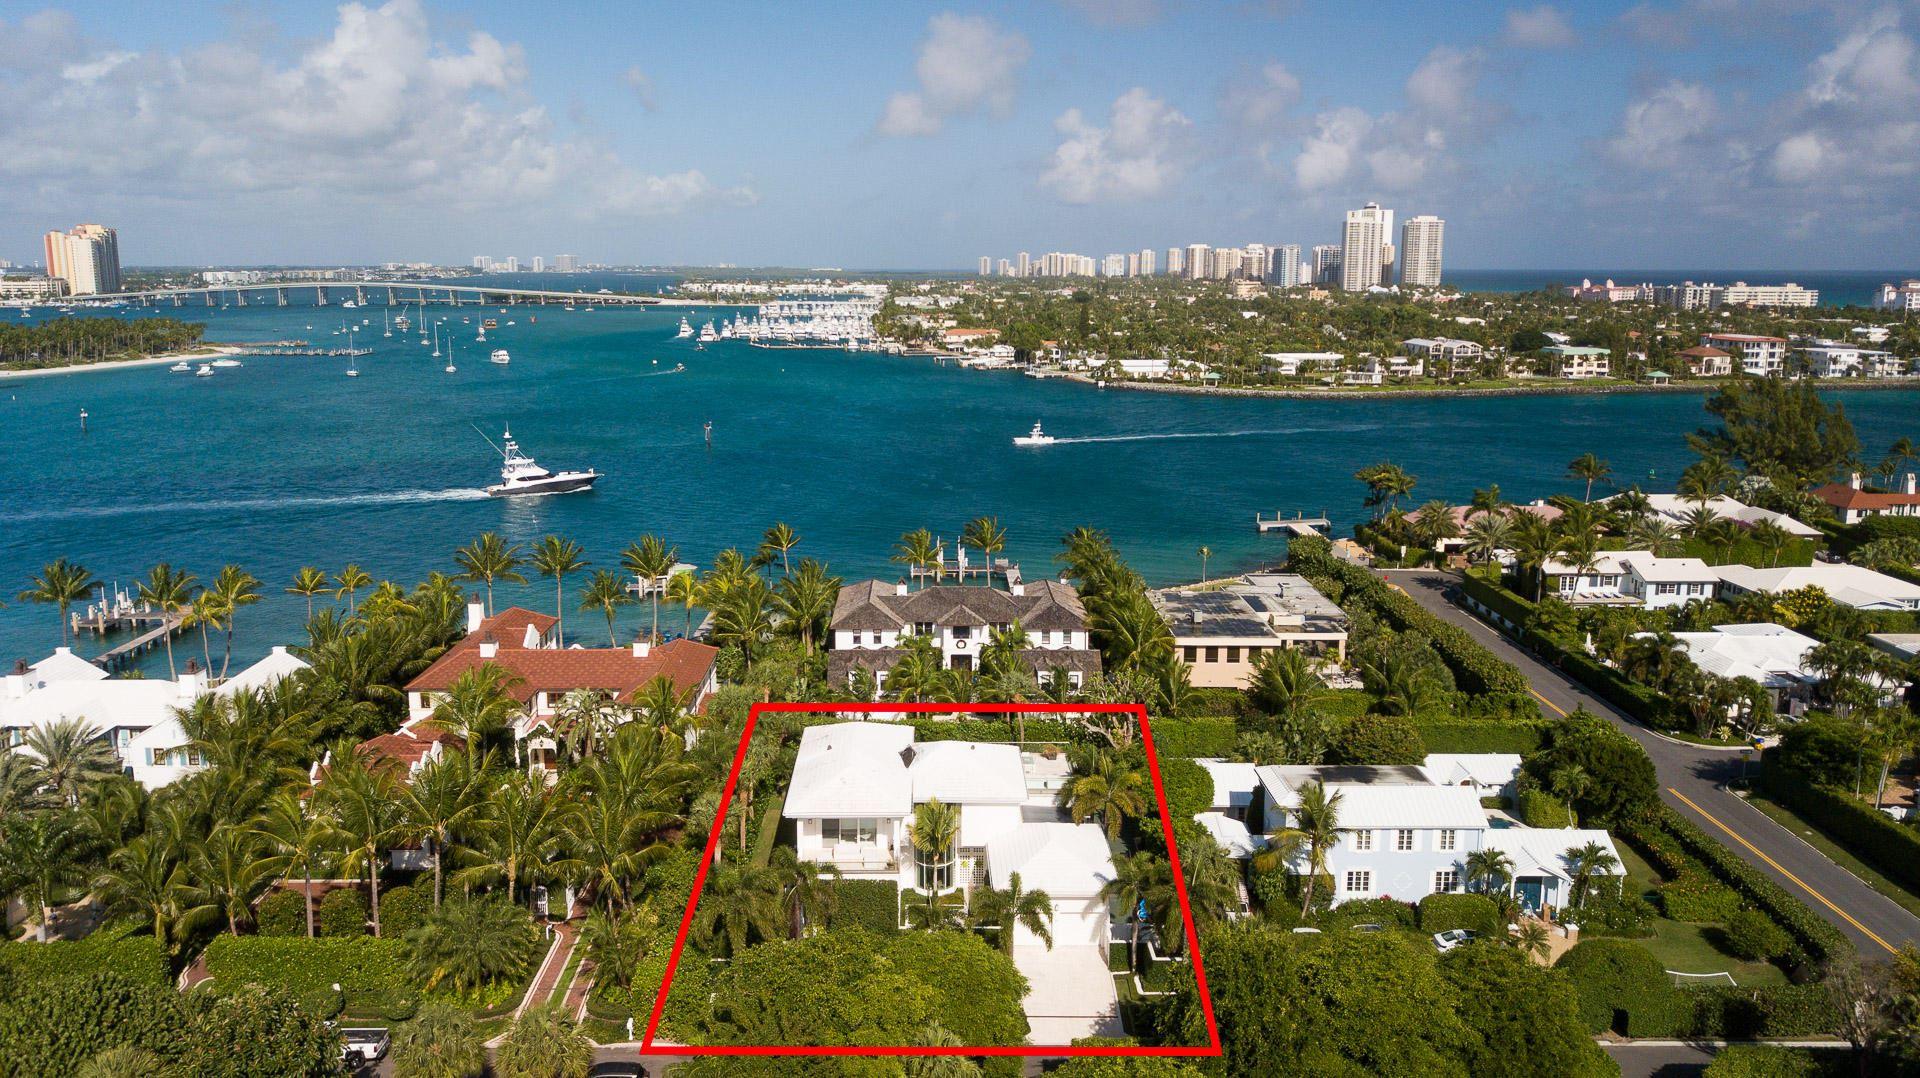 215 Indian Road, Palm Beach, FL 33480 - #: RX-10629690